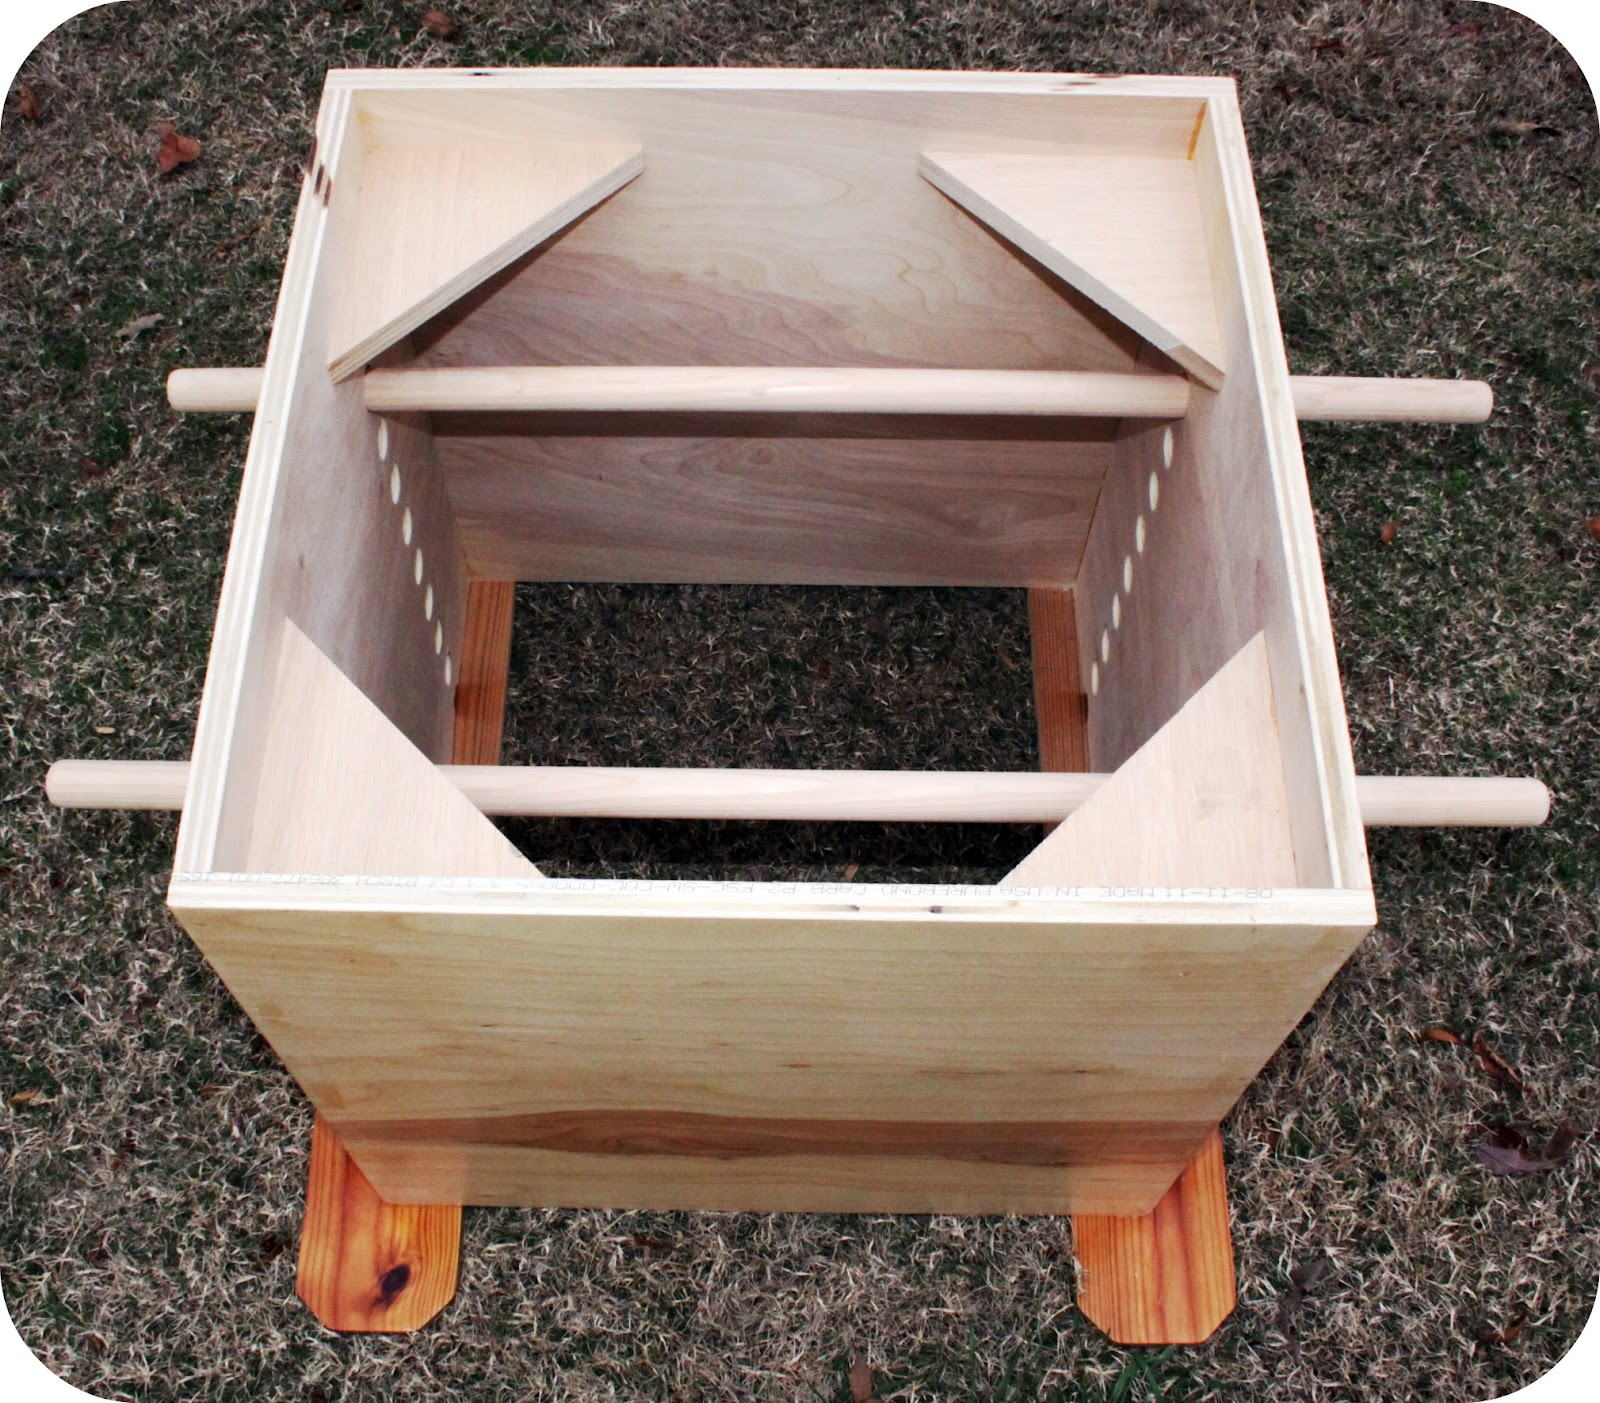 3 in 1 plyo box plans pdf